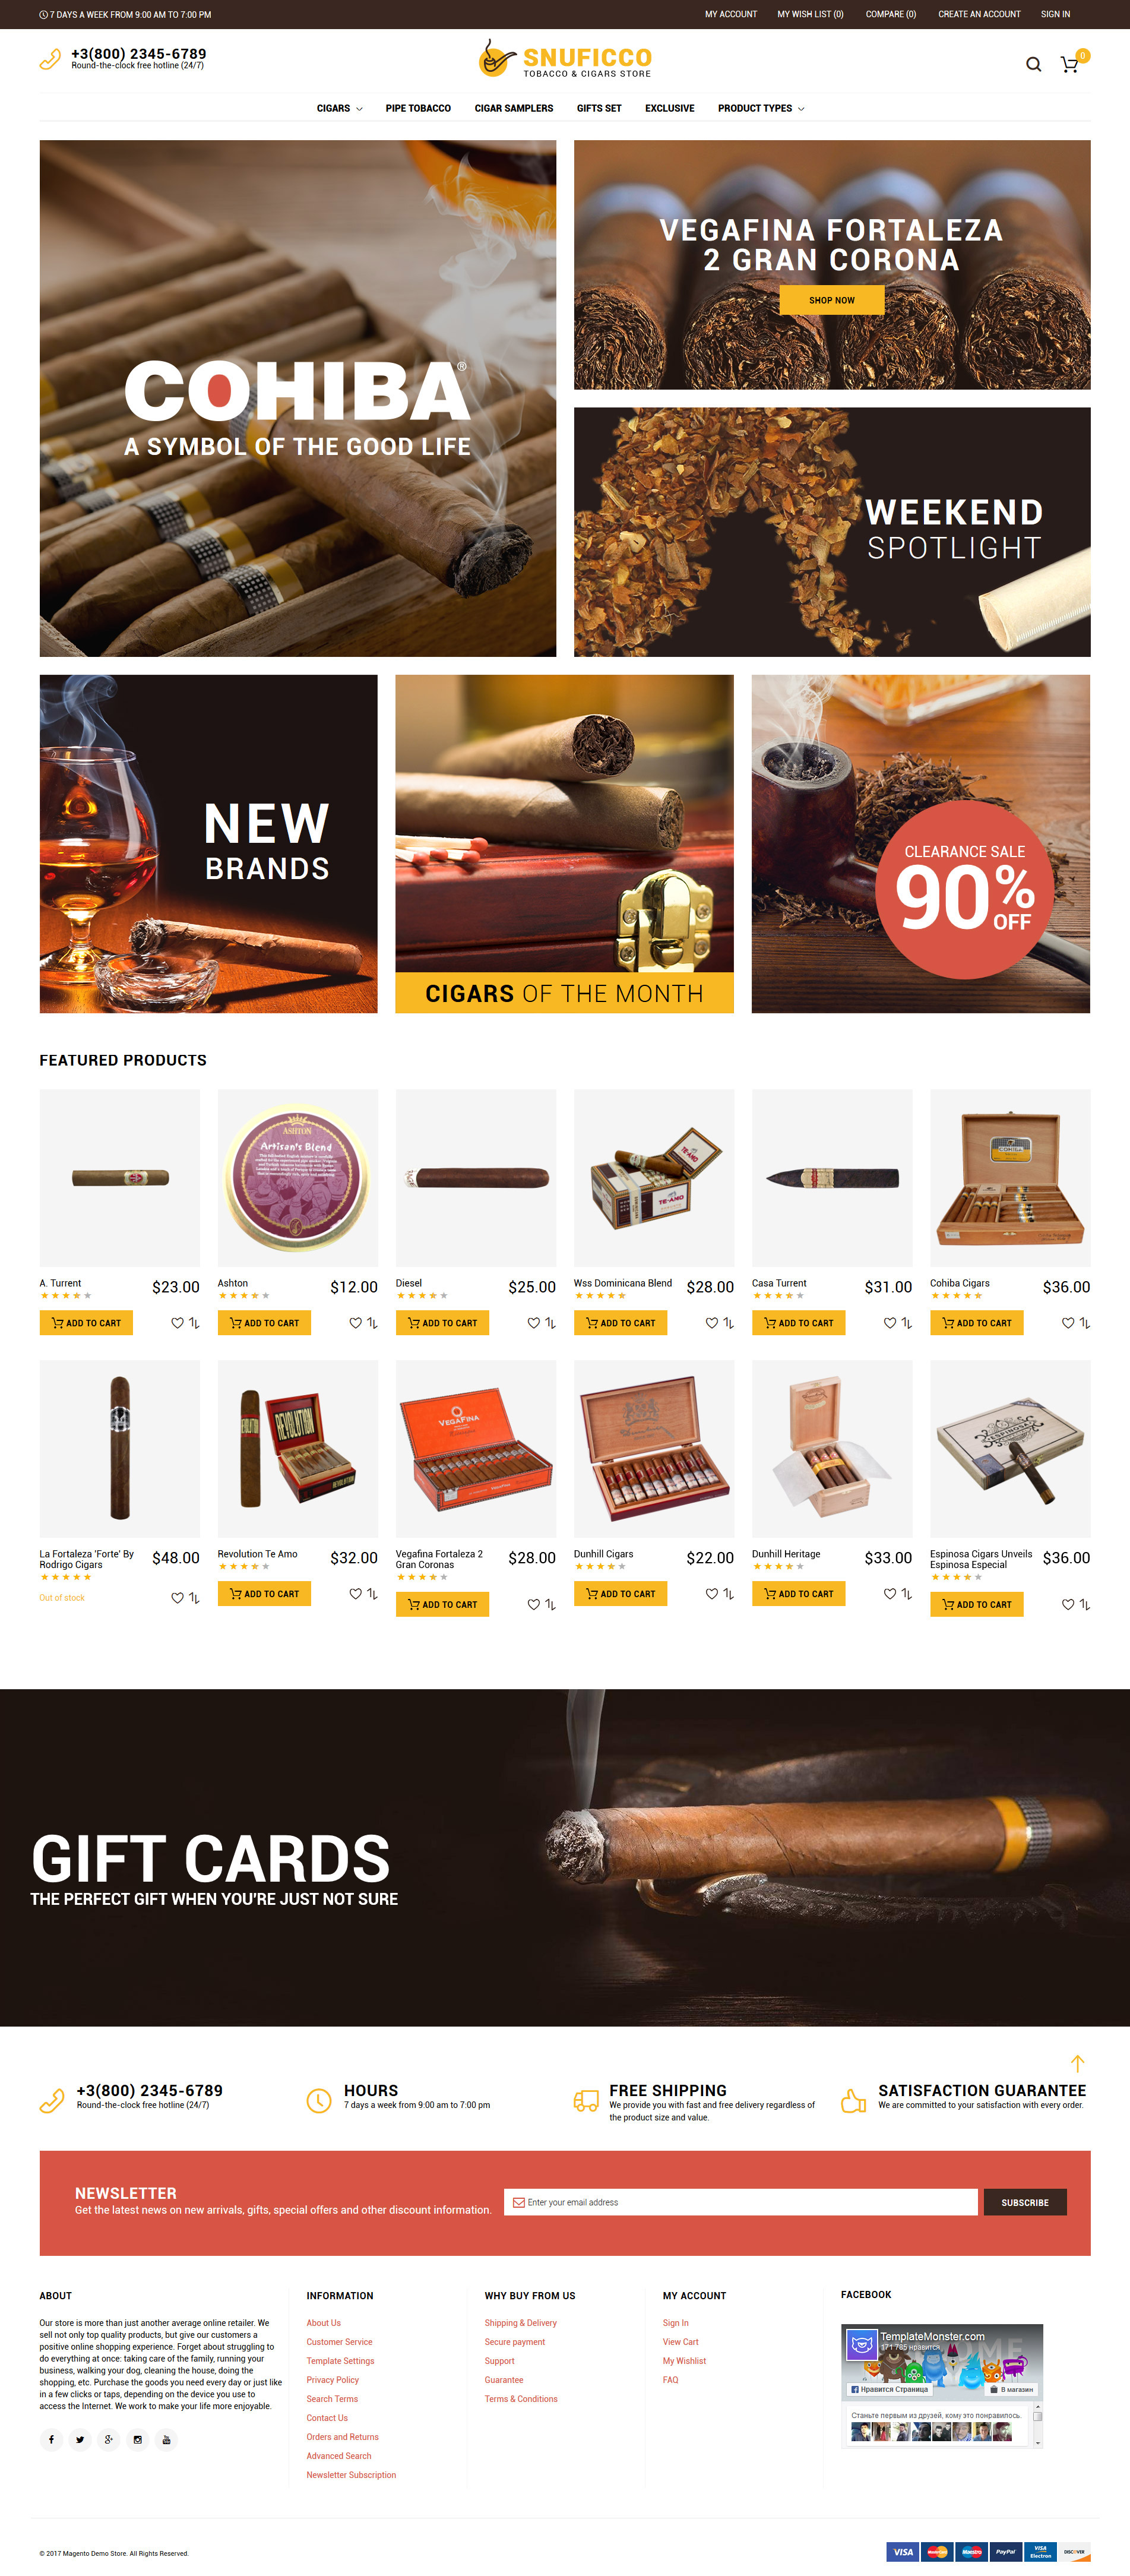 """Snuficco - Magasin de tabac et de cigares"" thème Magento adaptatif #64150"